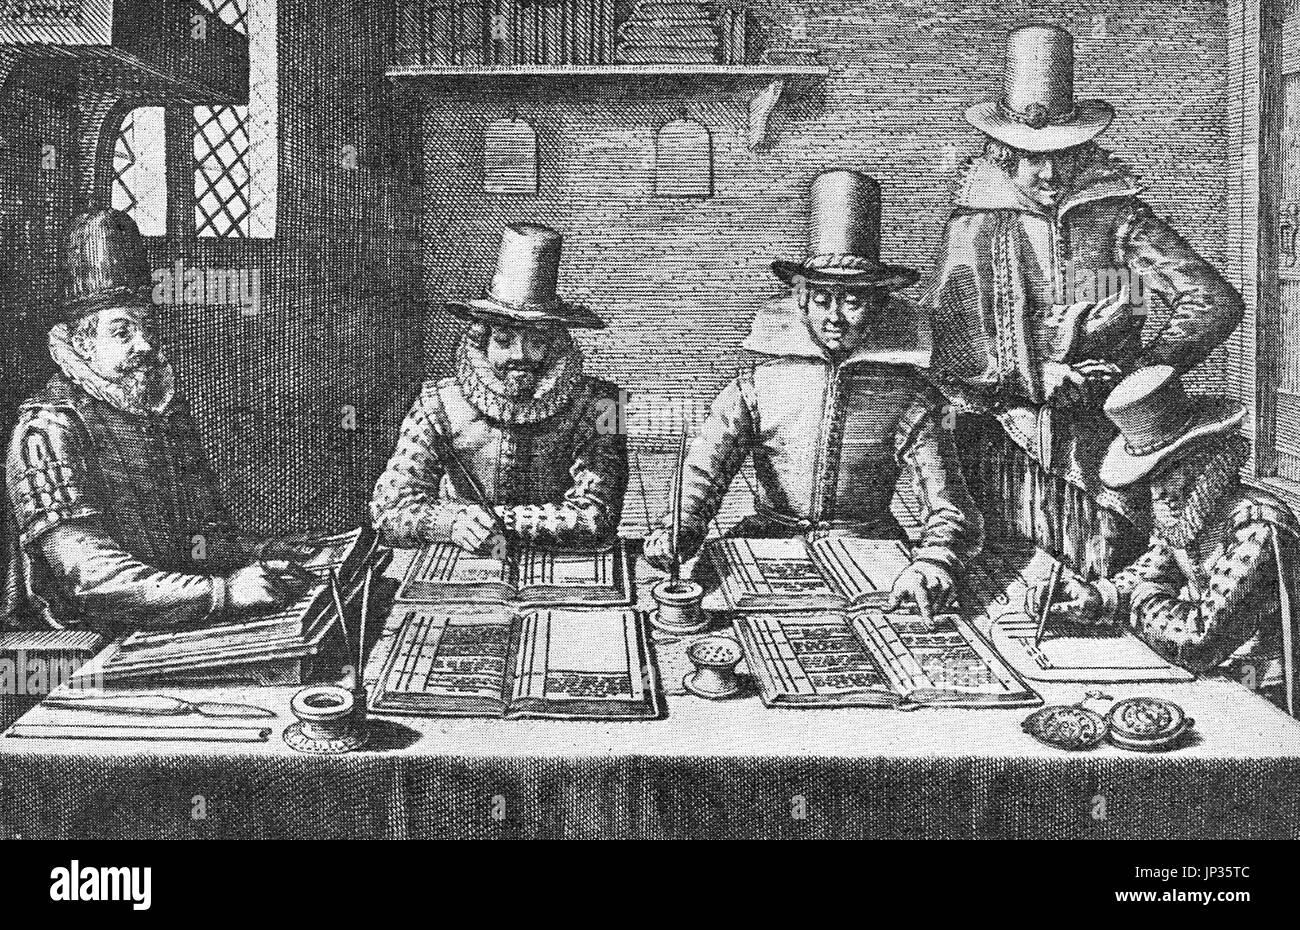 17th century English accountants in Elizabethan dress - Stock Image